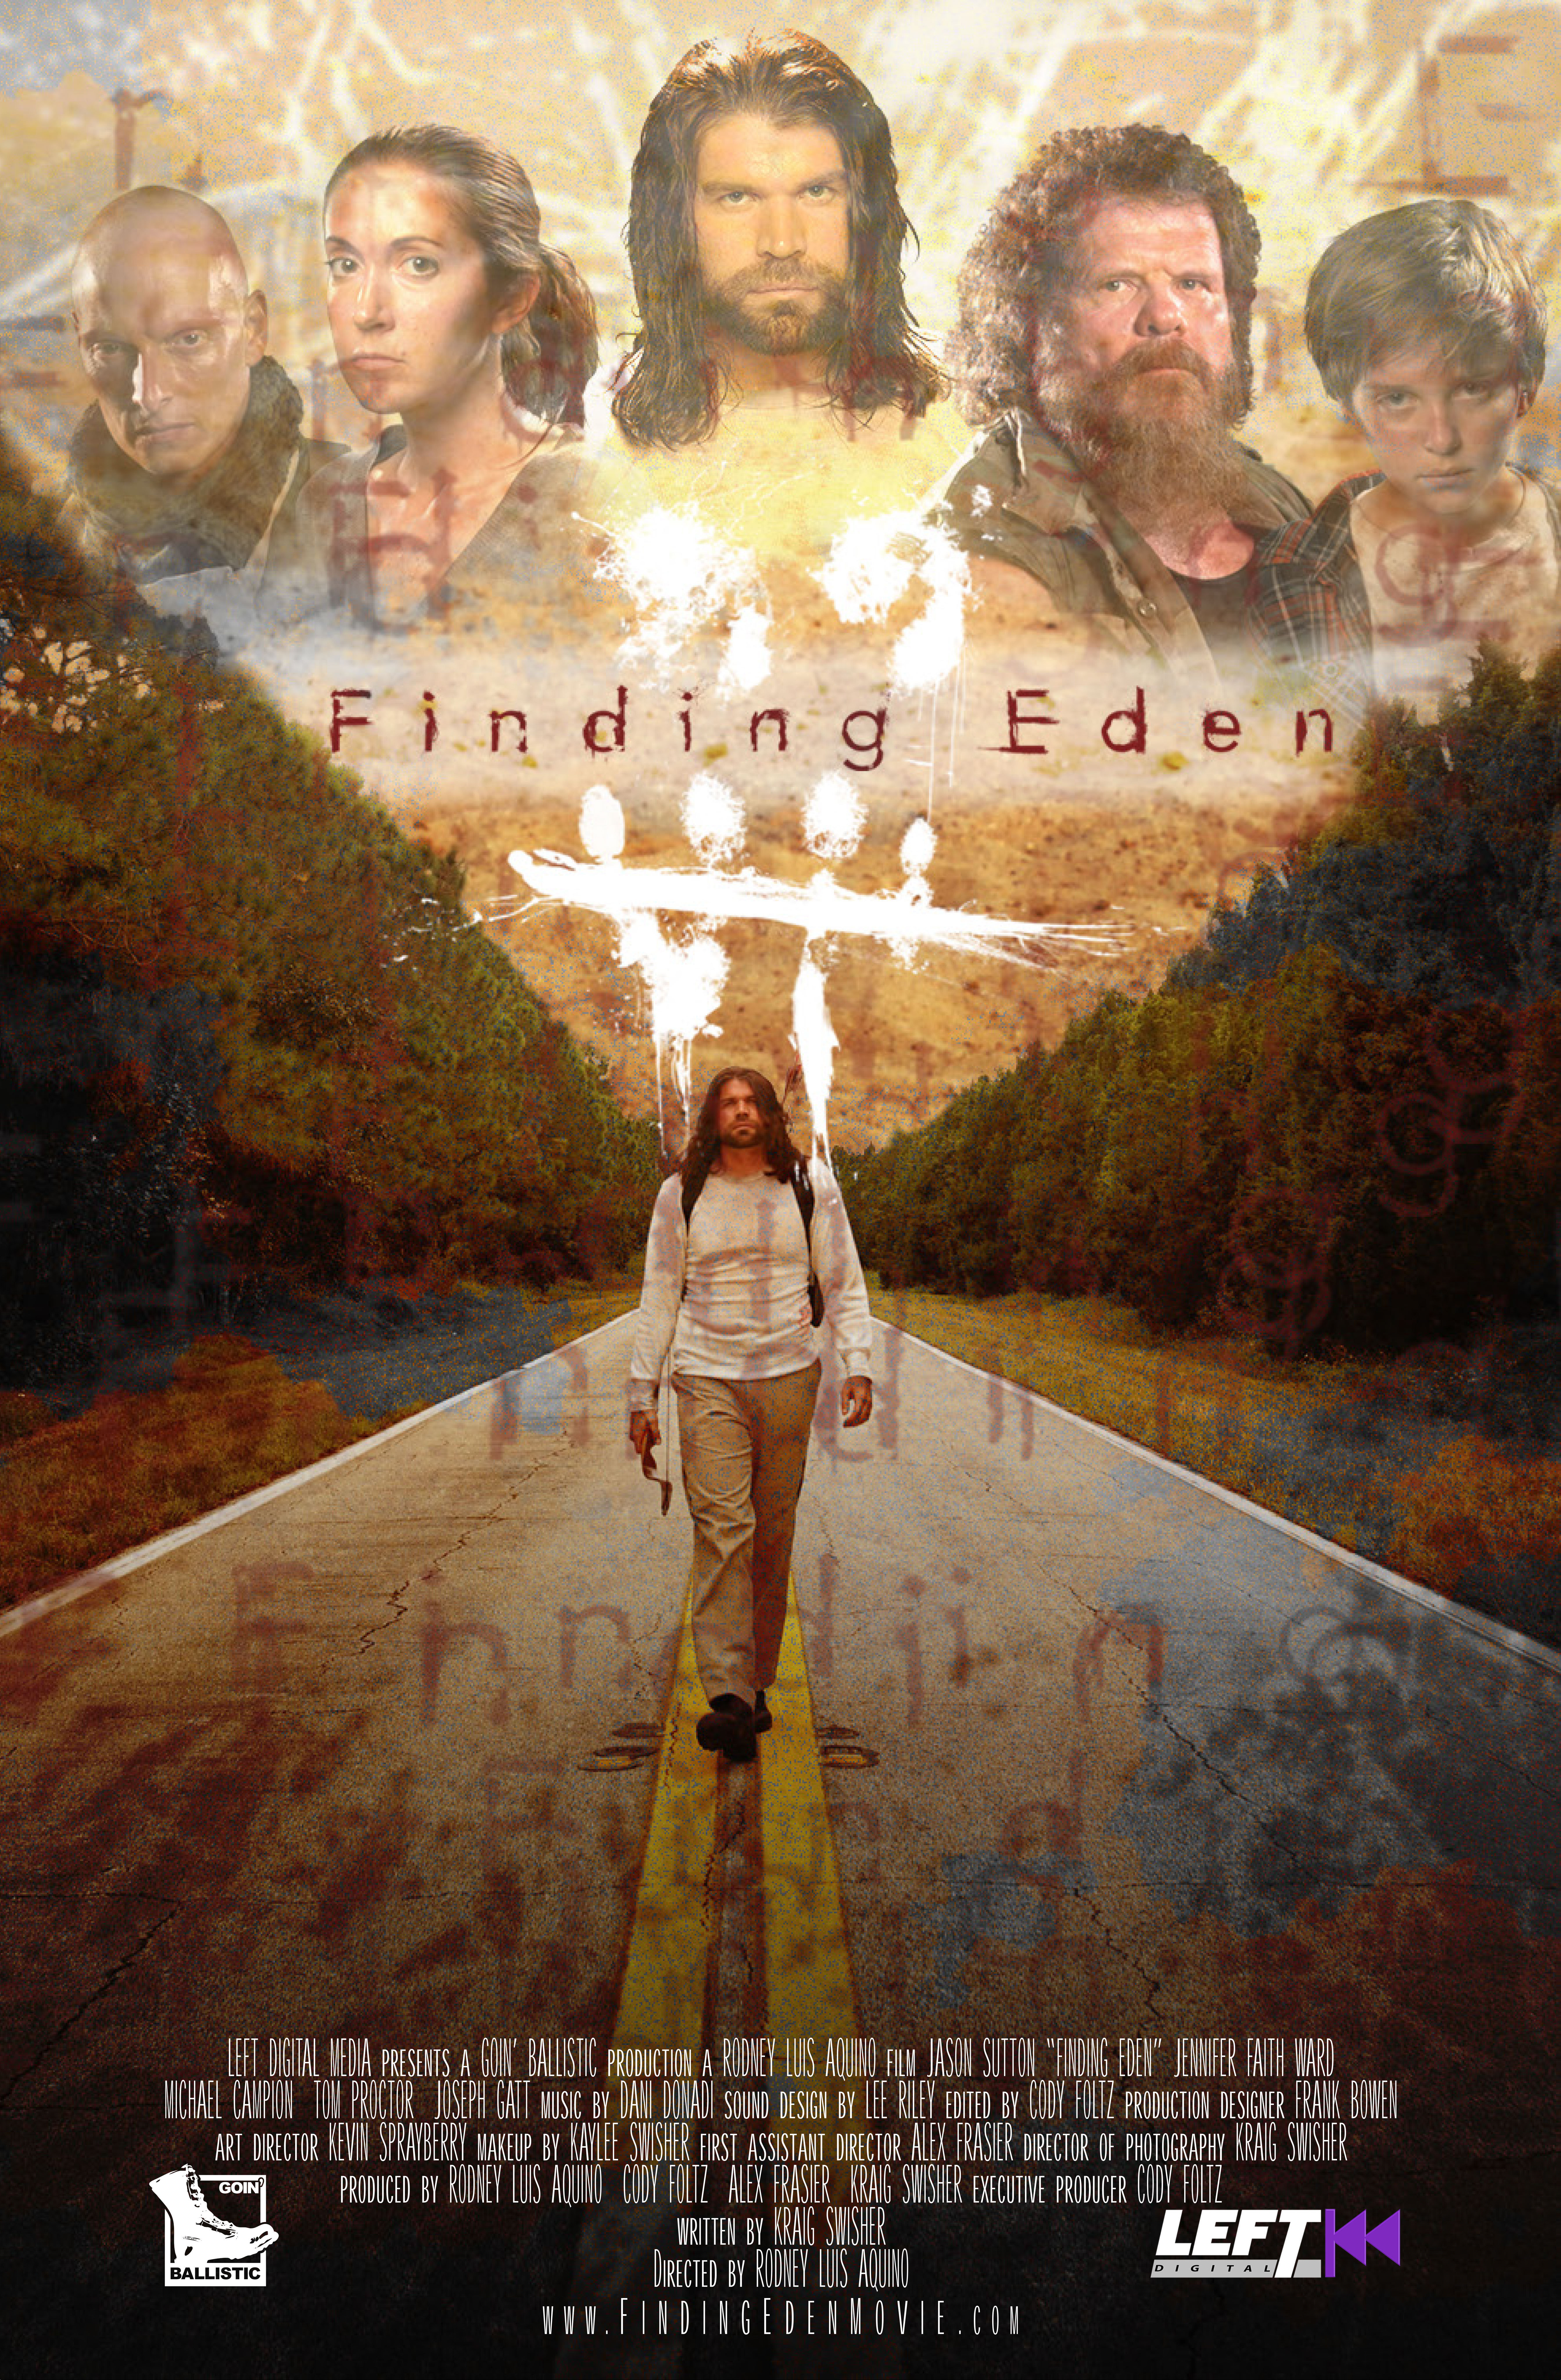 Tom Proctor, Joseph Gatt, Jason Sutton, Jennifer Faith Ward, and Michael Campion in Finding Eden (2017)